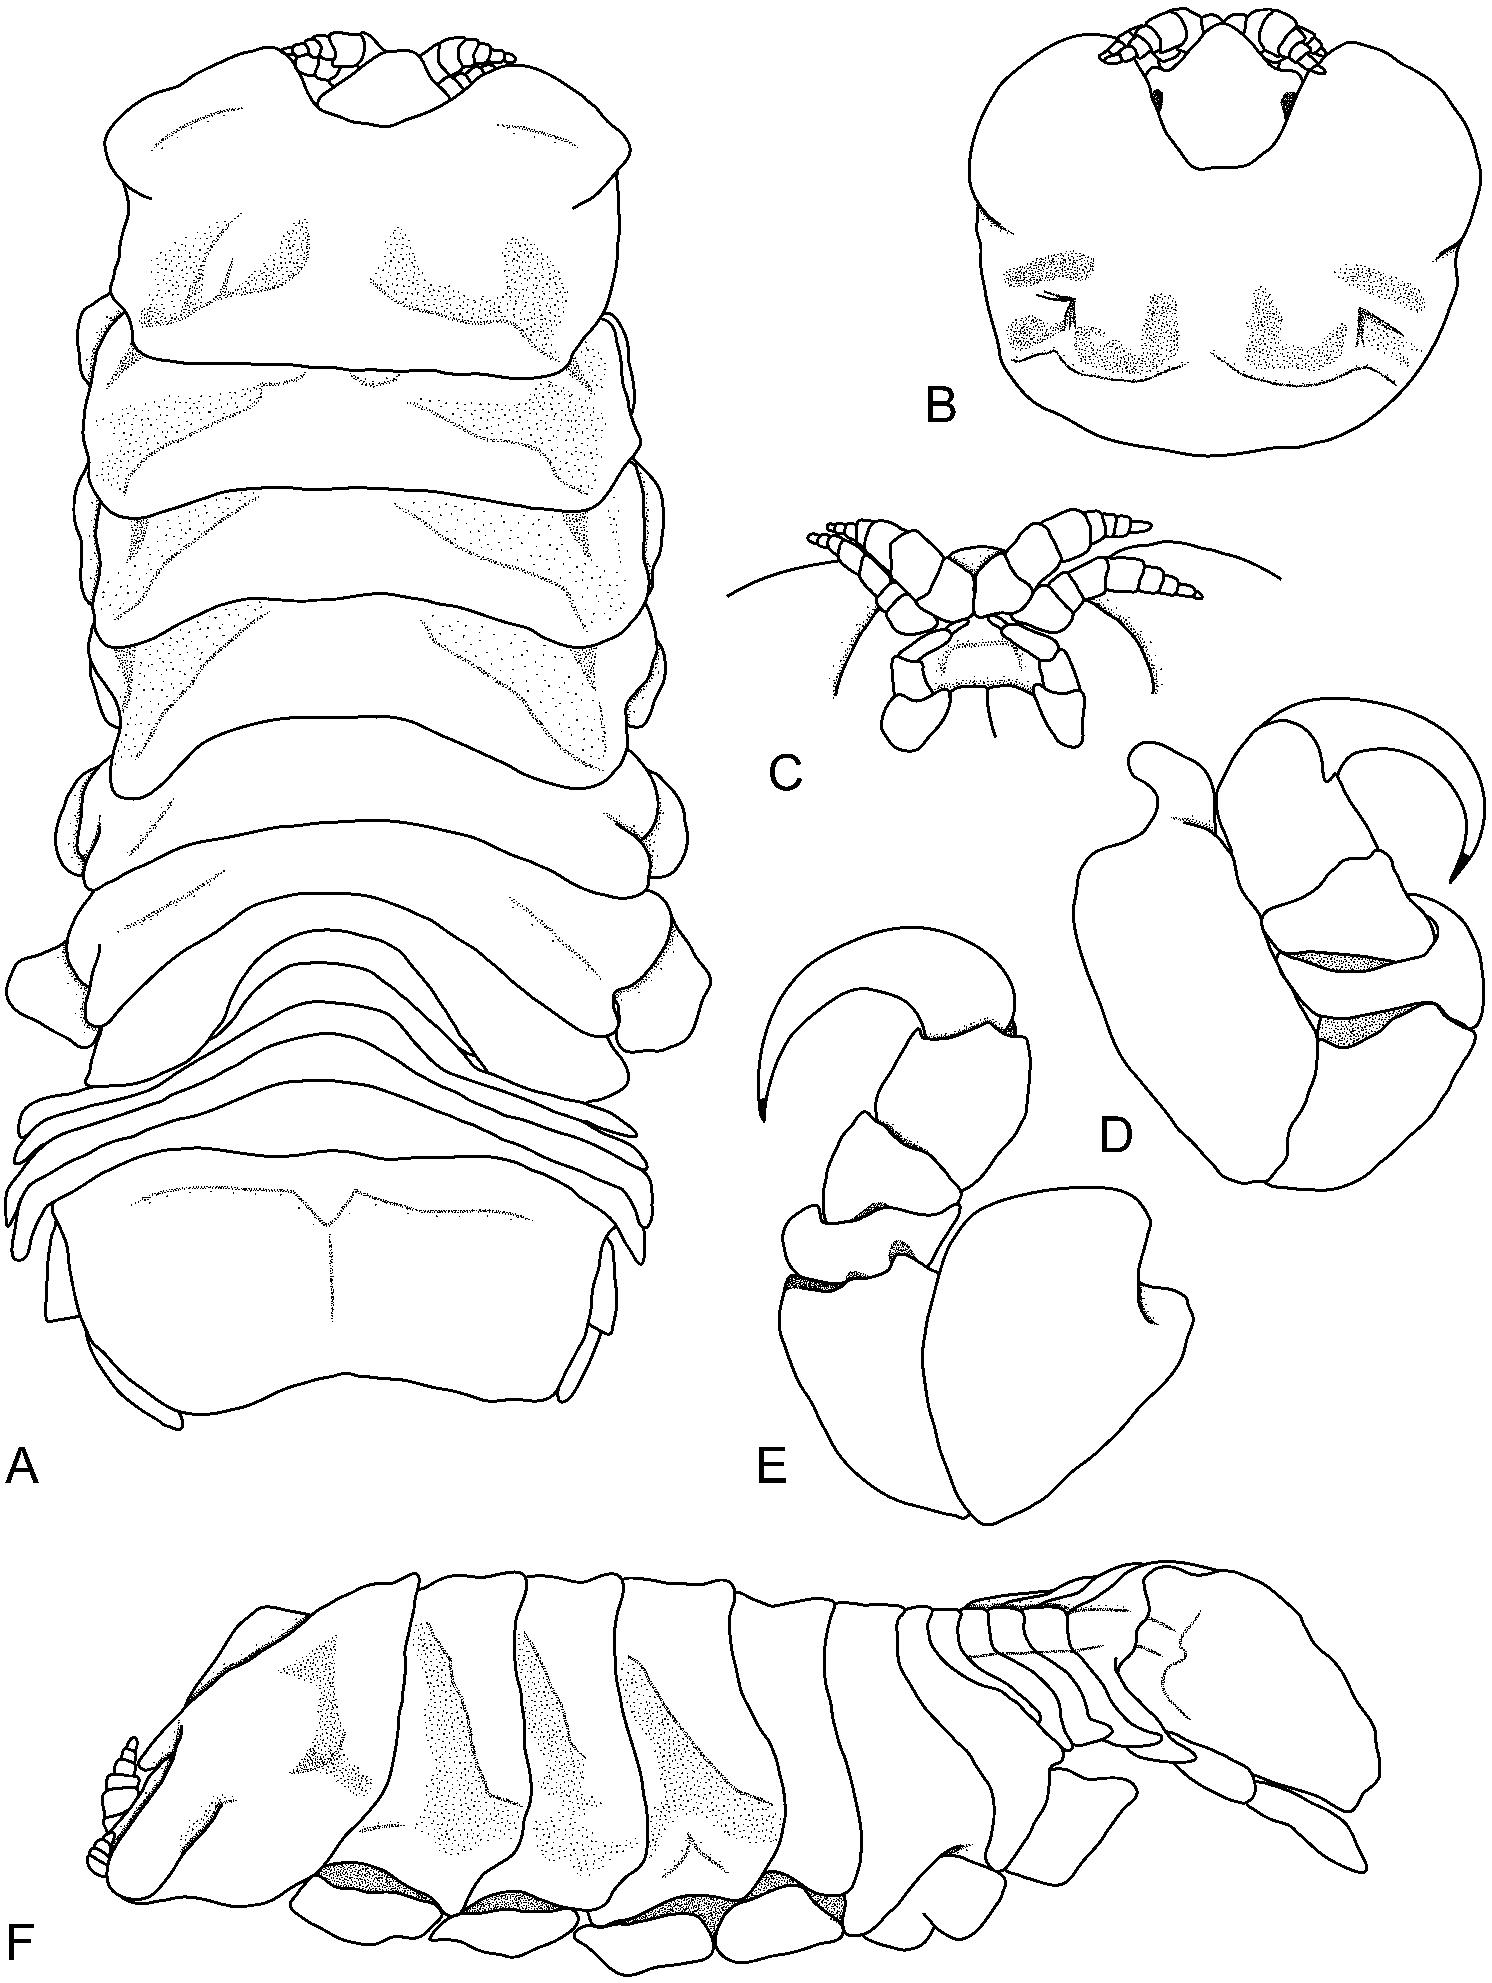 ceratothoa retusa schi dte meinert 1883 isopoda HK P30 fig 7